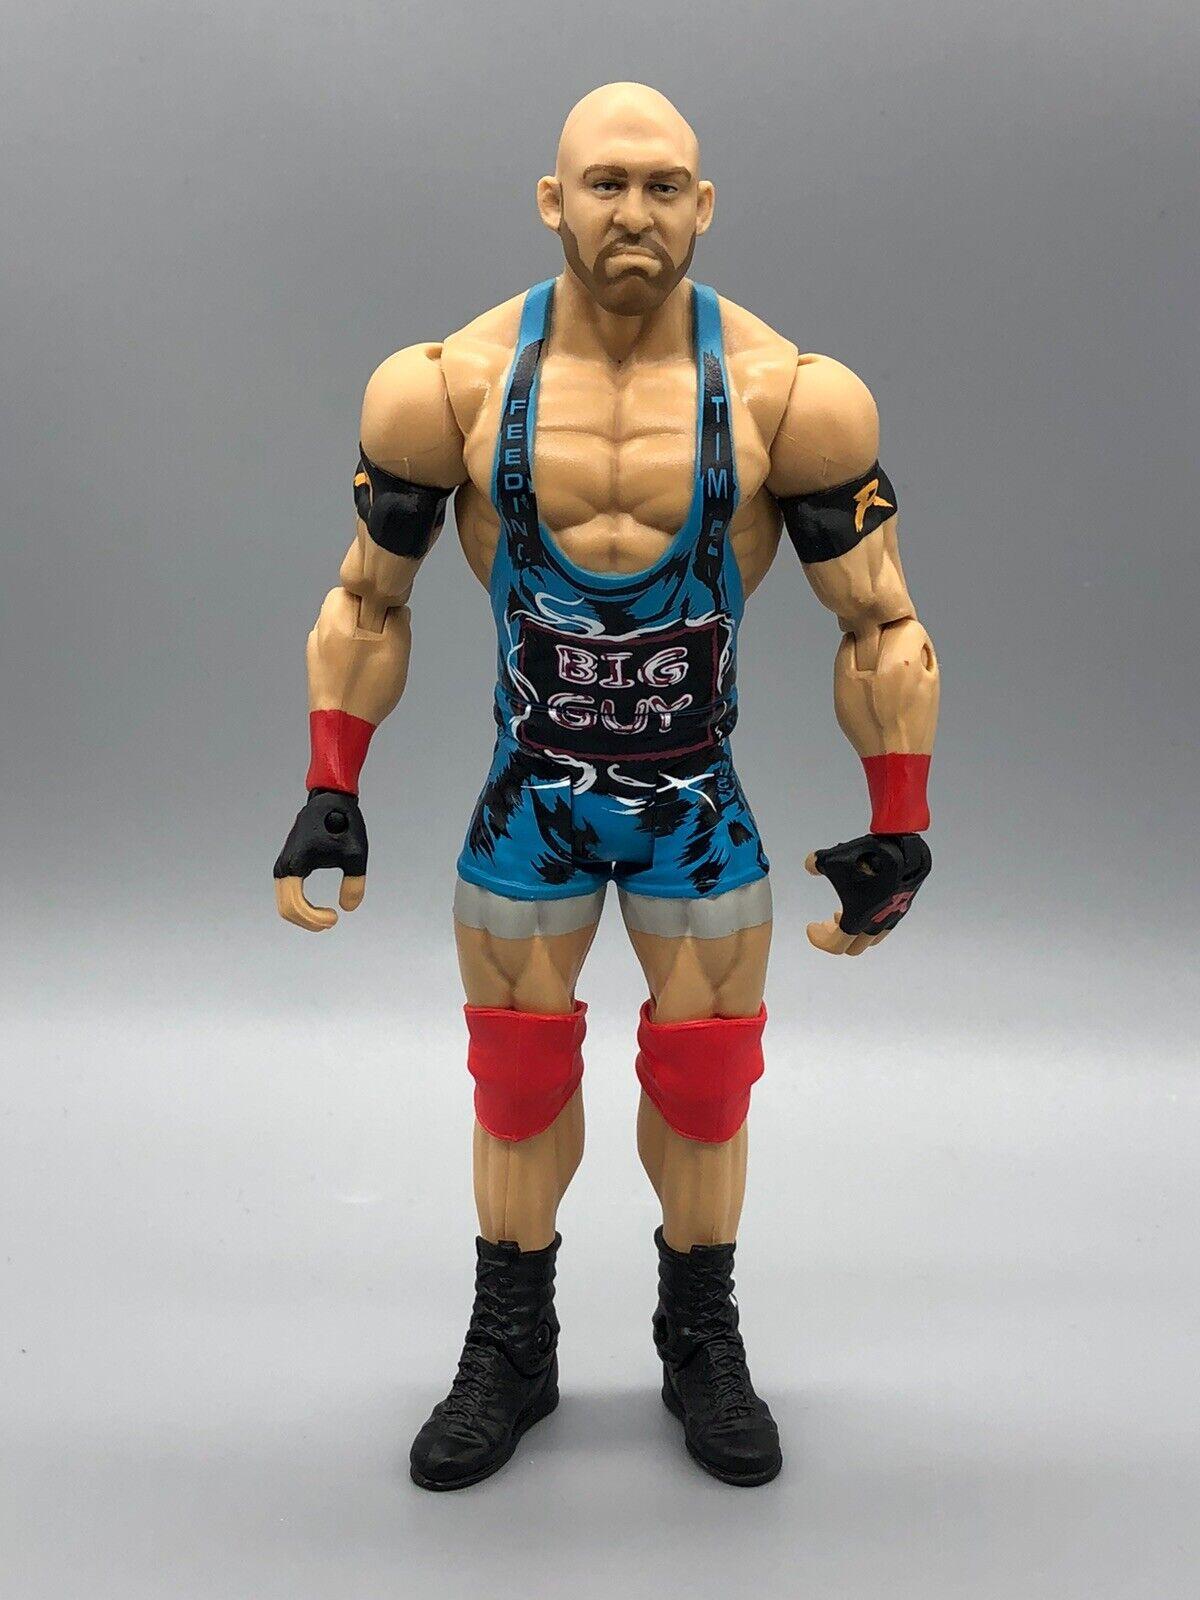 Ryback WWE Smack Down-DJR64 NIB Action Figure